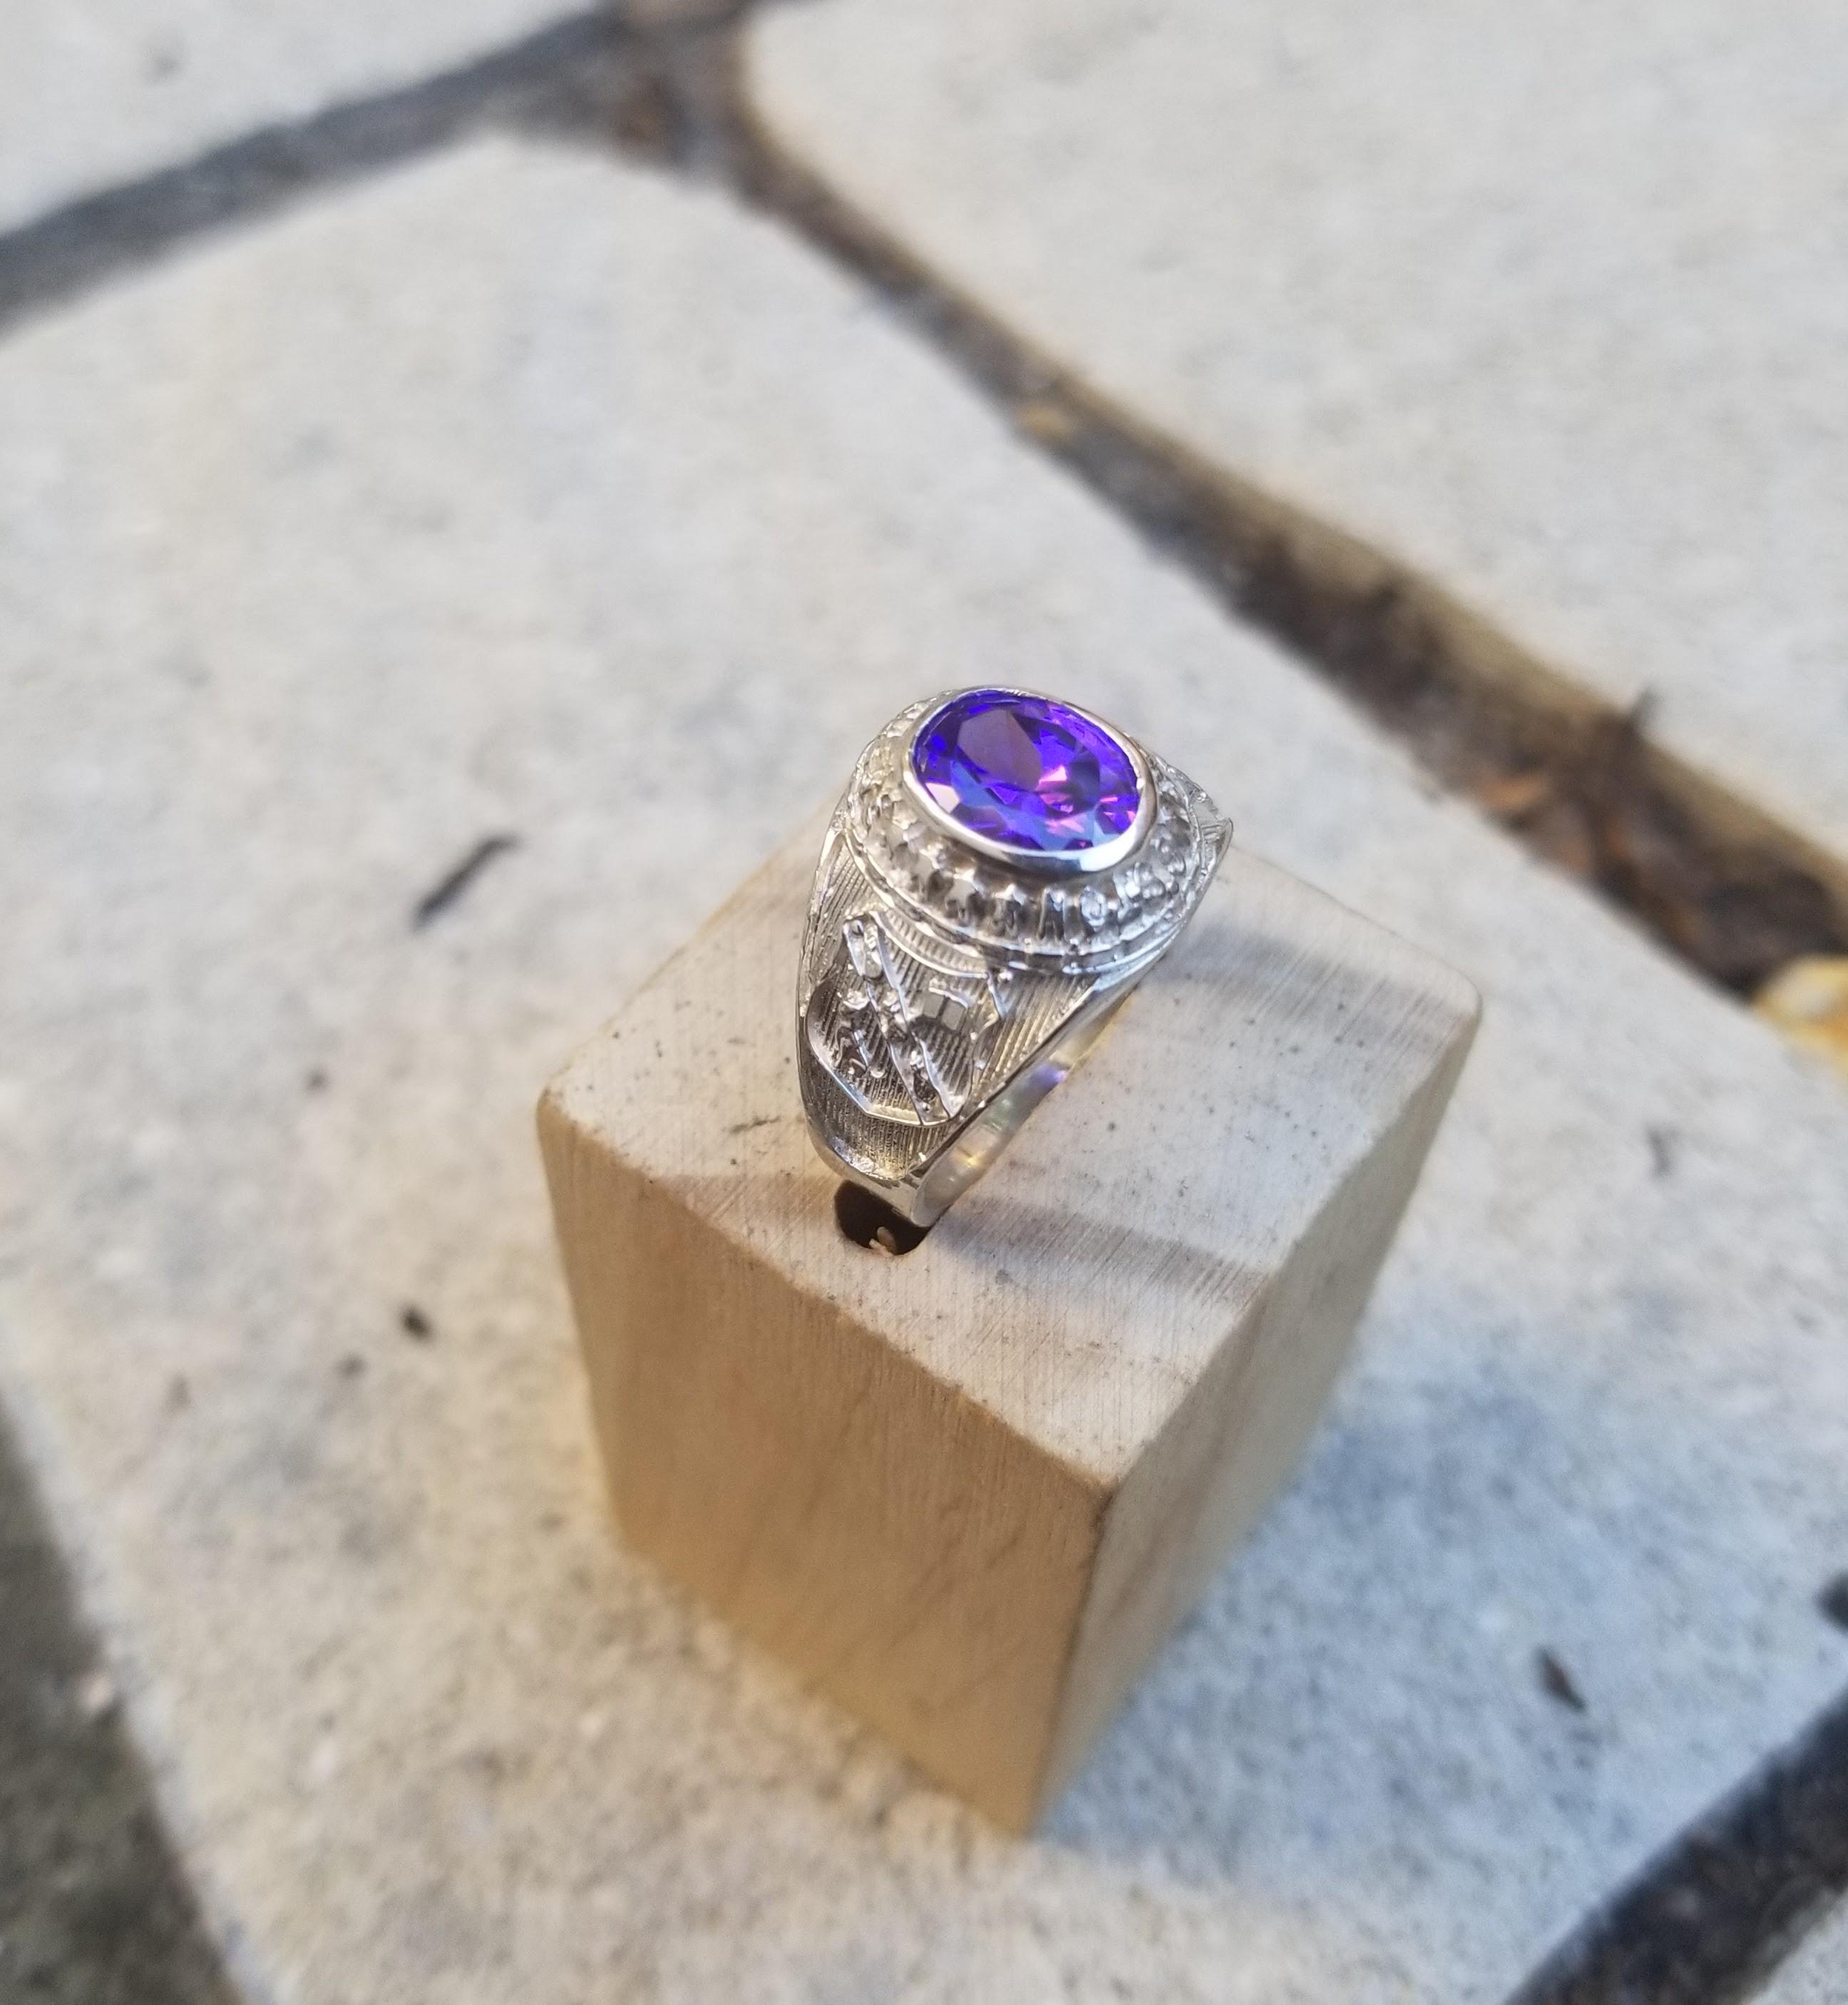 kingston college class graduation ring with purple stone